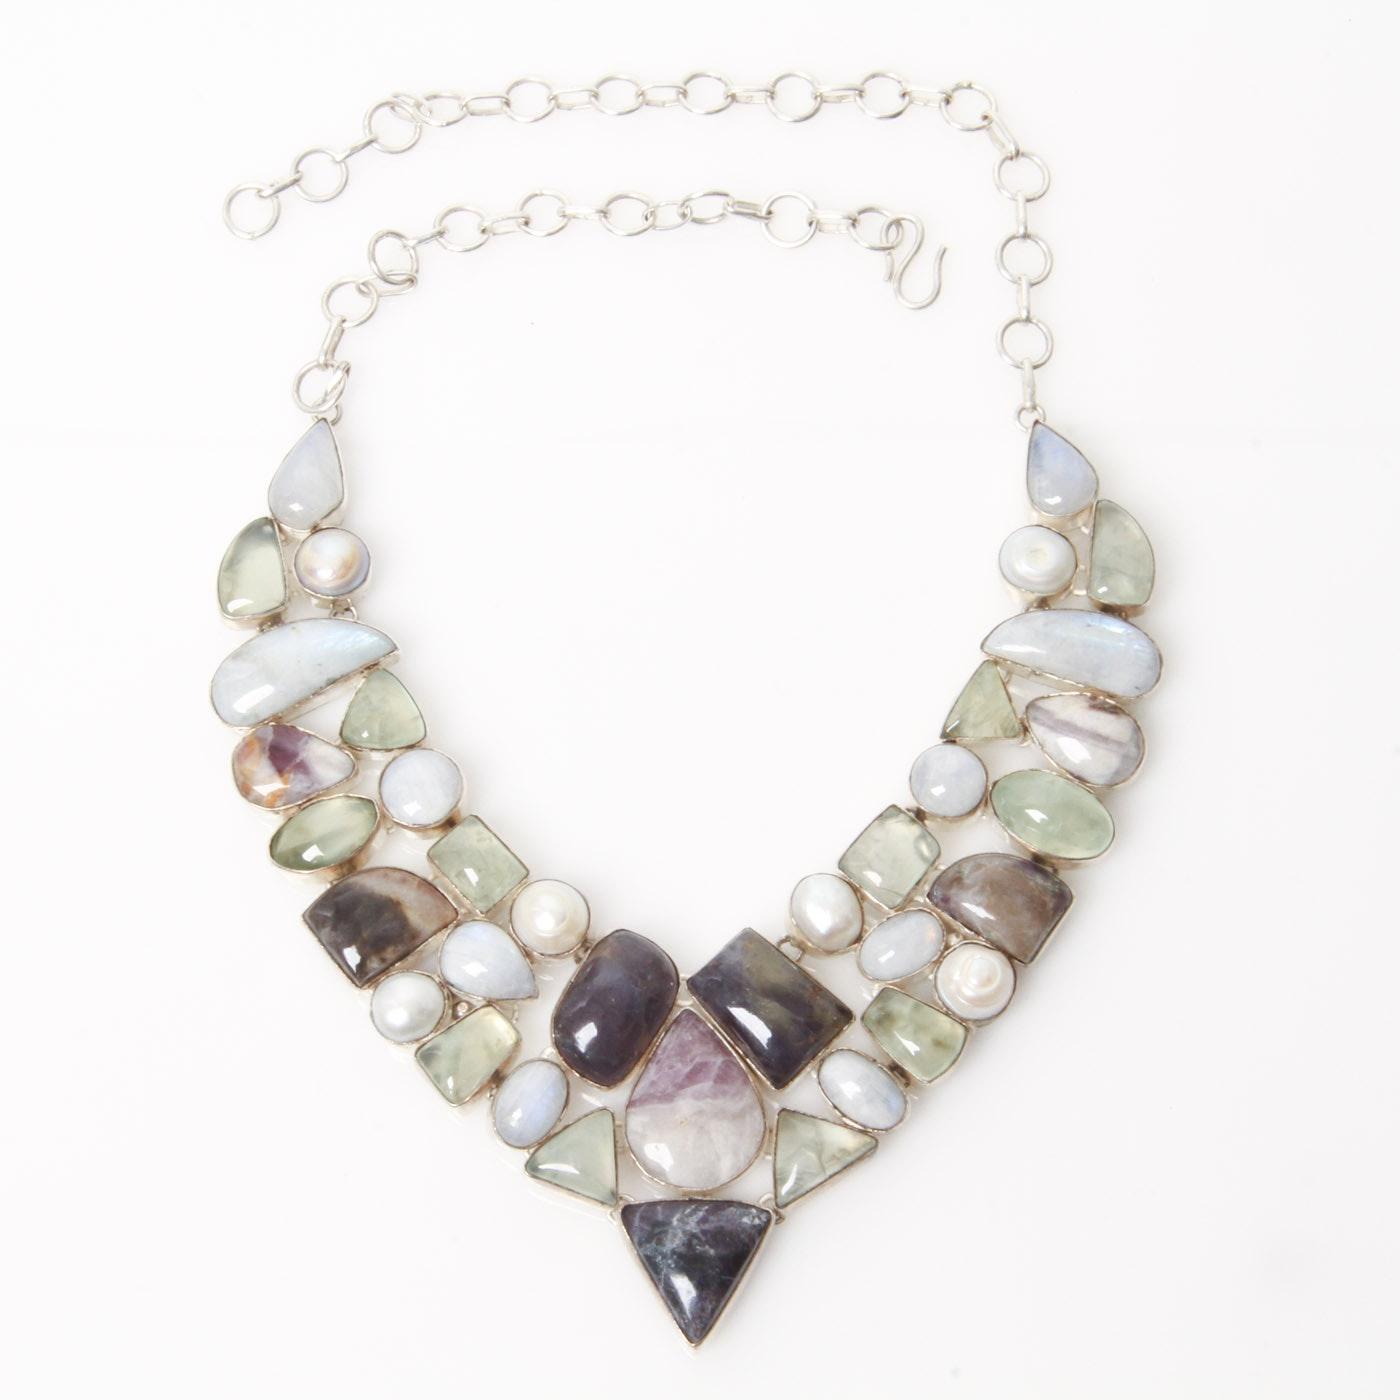 Labradorite, Baroque Pearl, and Agate Bib Necklace